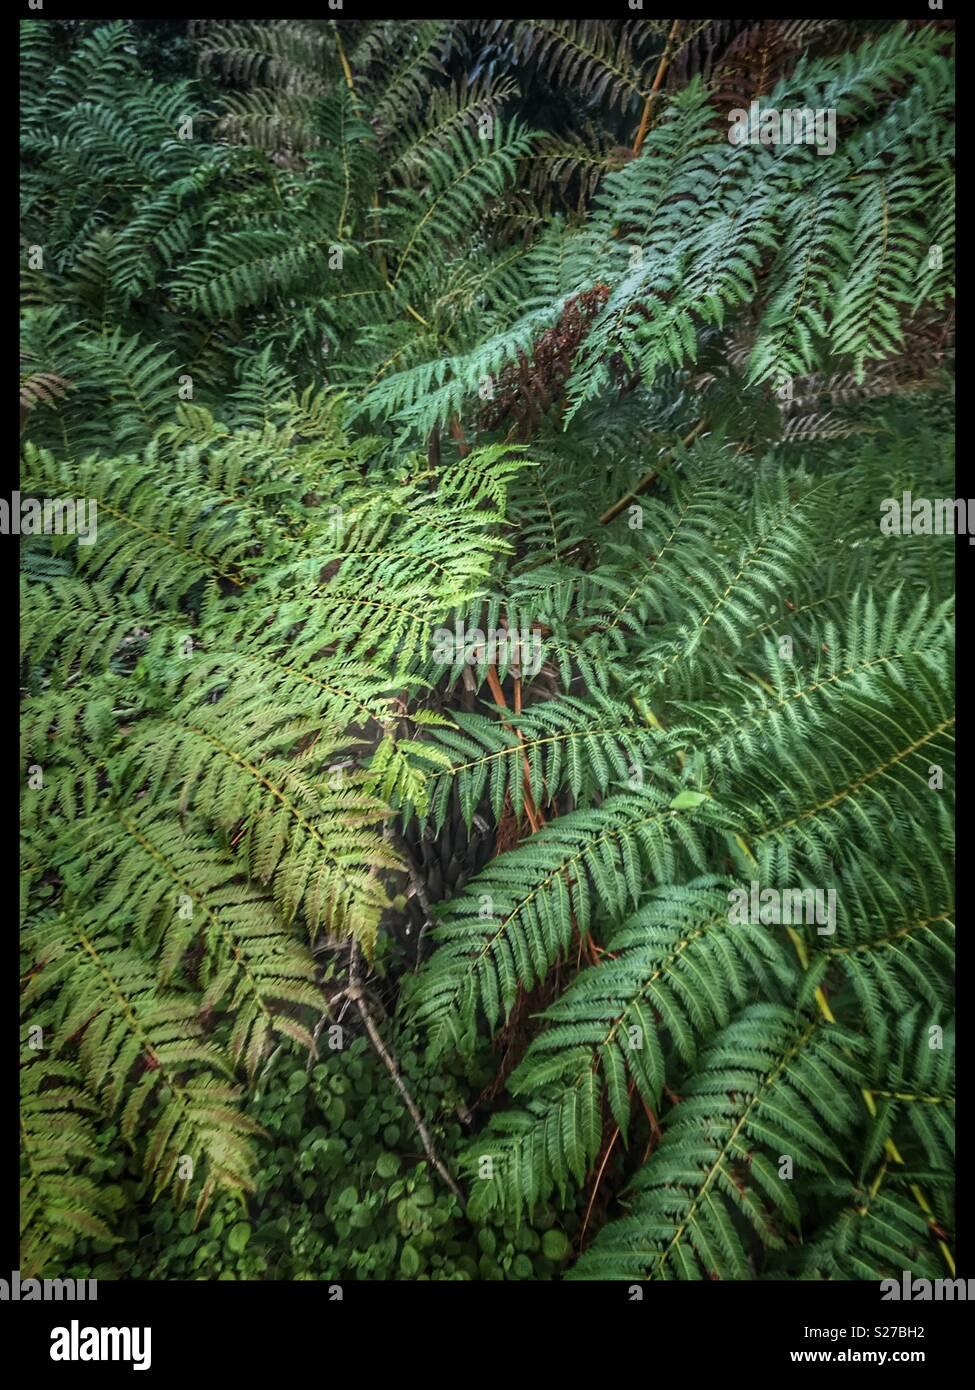 Hojas de helecho en Kirstenbosch National Botanical Gardens, Cape Town, Sudáfrica. Imagen De Stock